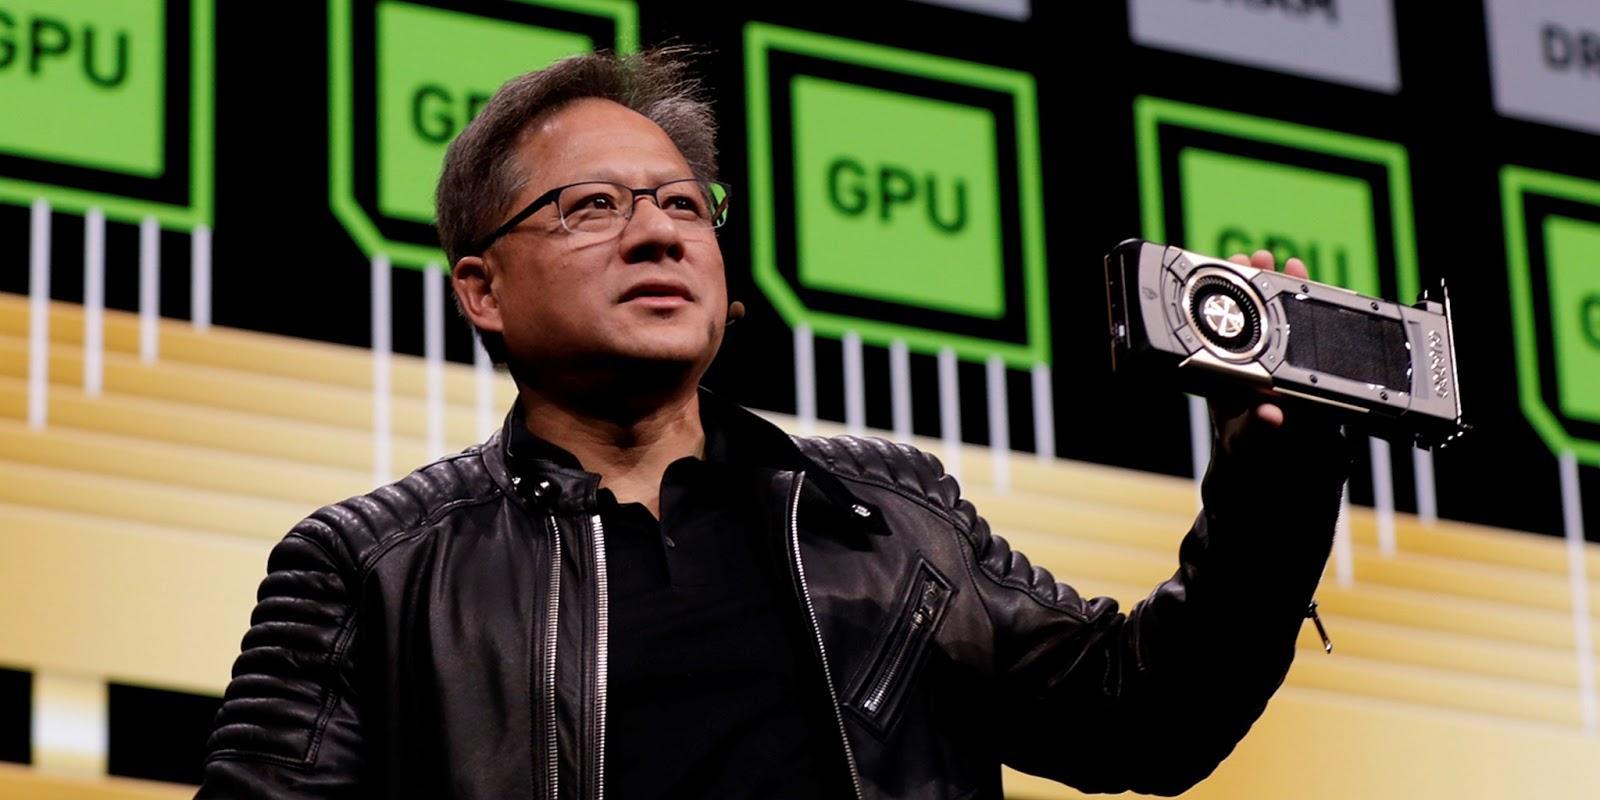 El CEO de NVIDIA Jensen Huang dará el discurso de apertura en la principal  conferencia mundial sobre IA